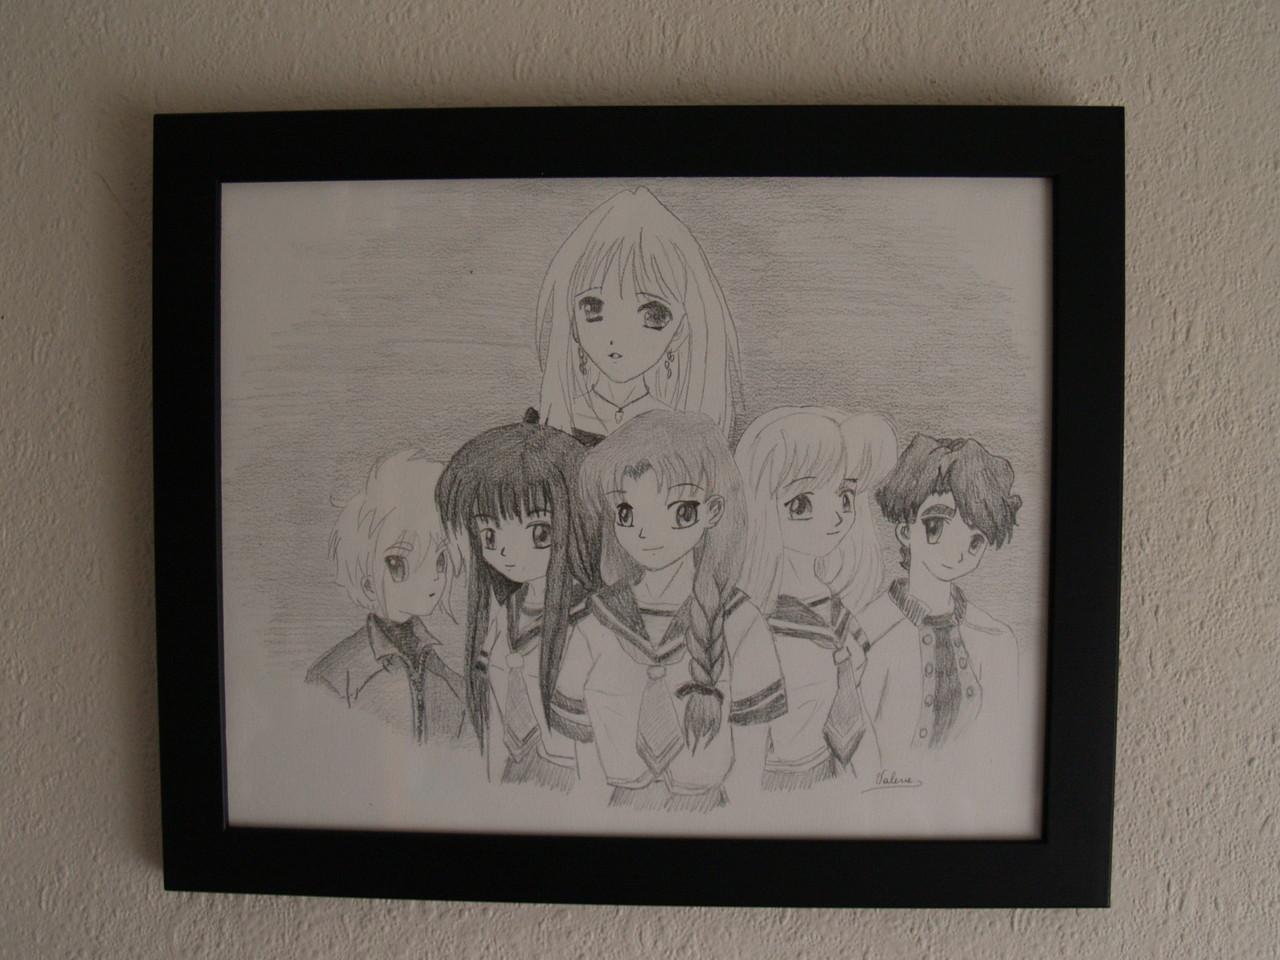 Manga zelfportret (tekenpotlood op wit papier)